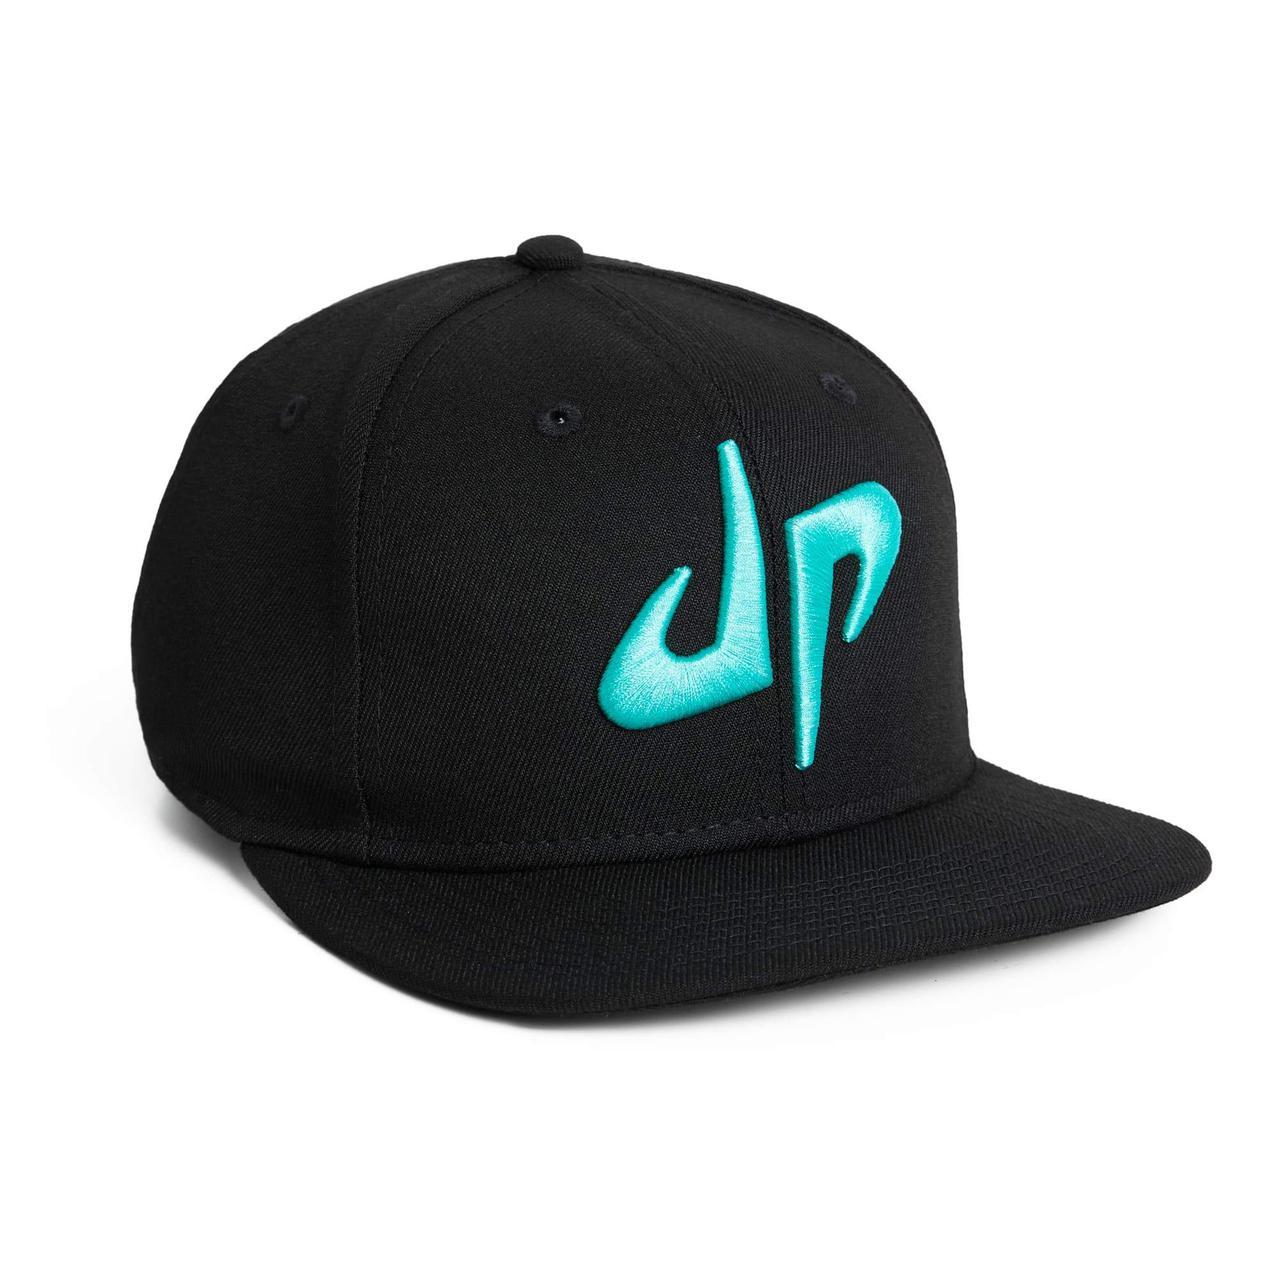 Dude Perfect DP x New Era 9Fifty Snapback    Black + Green 74517b4ce02